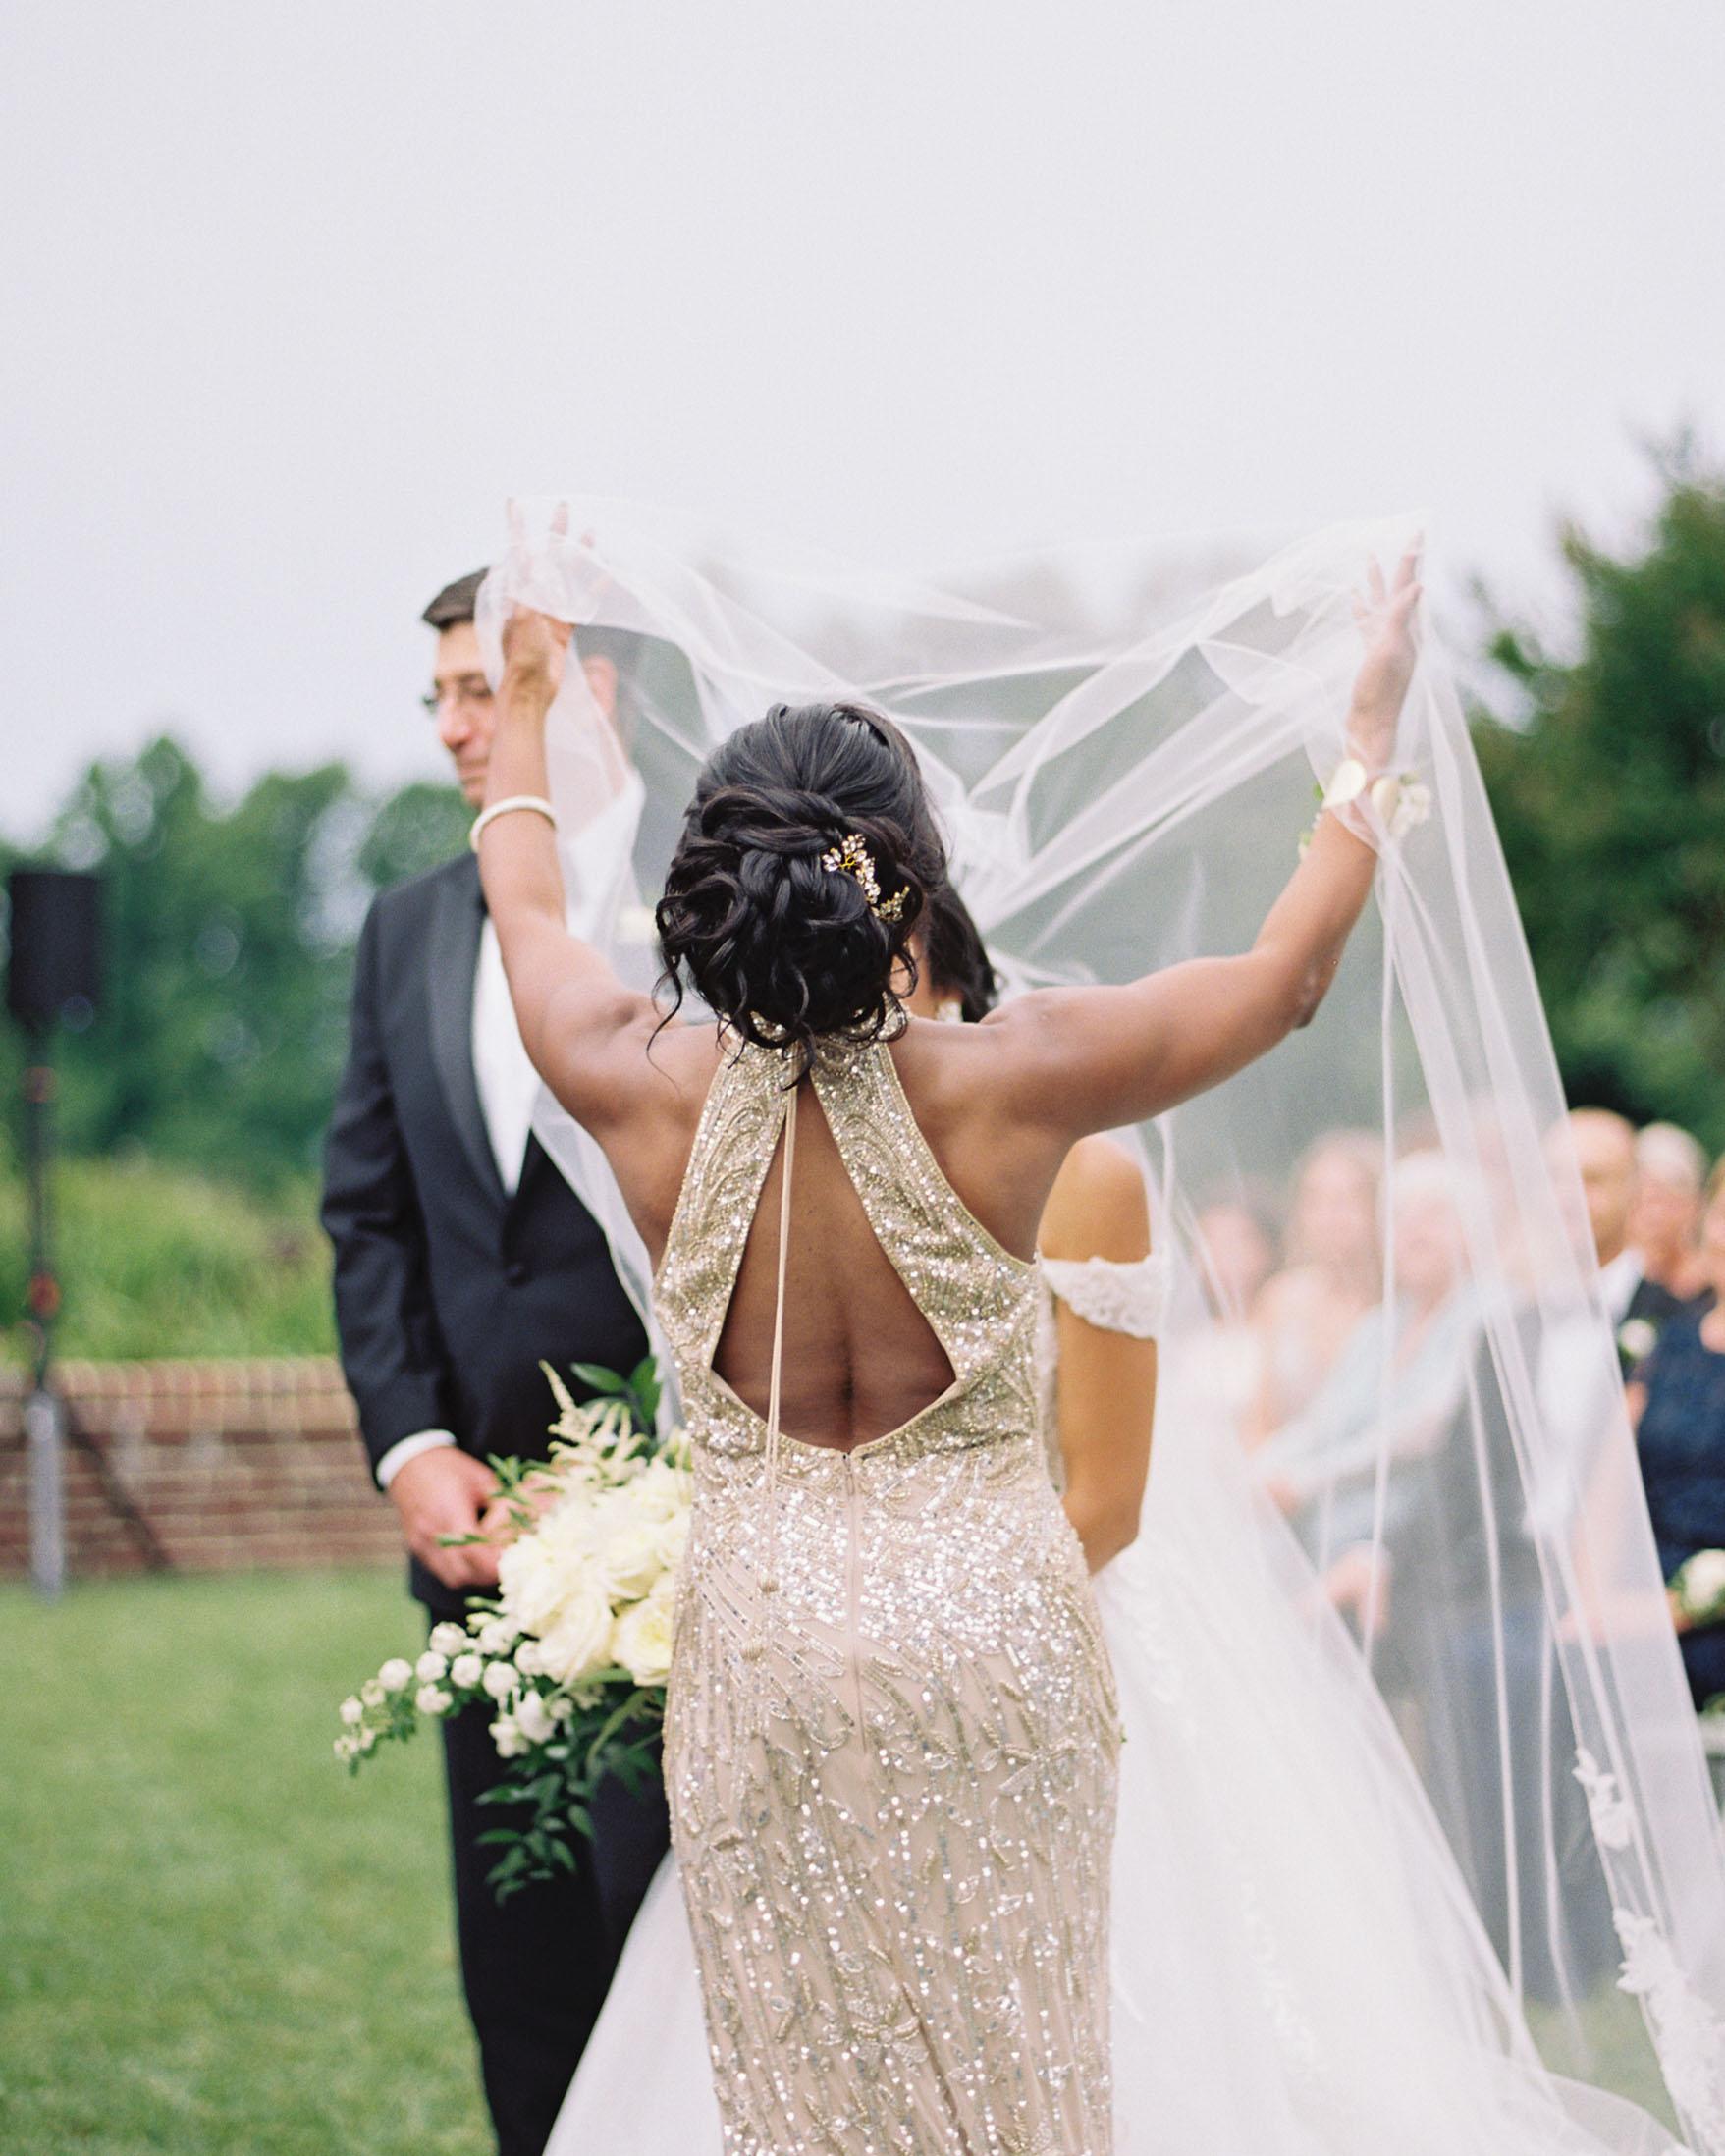 macey joshua bride's mother lifting veil